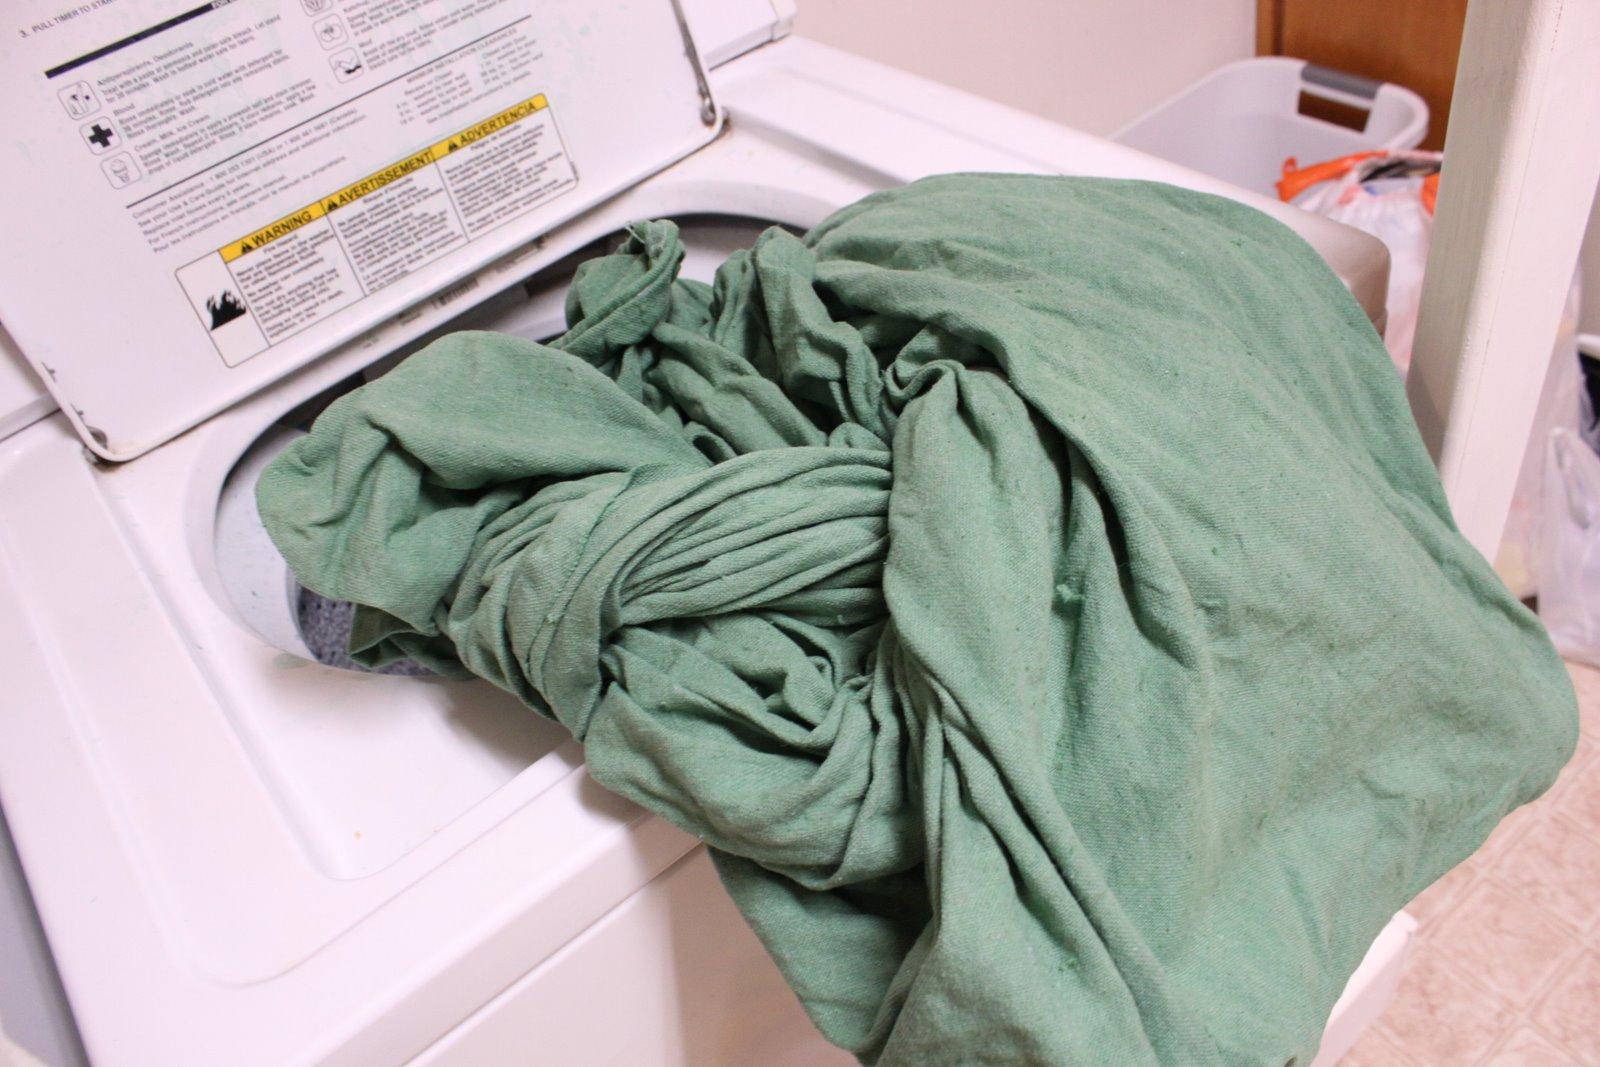 Drop cloth curtains dyed - Sunday December 11 2011